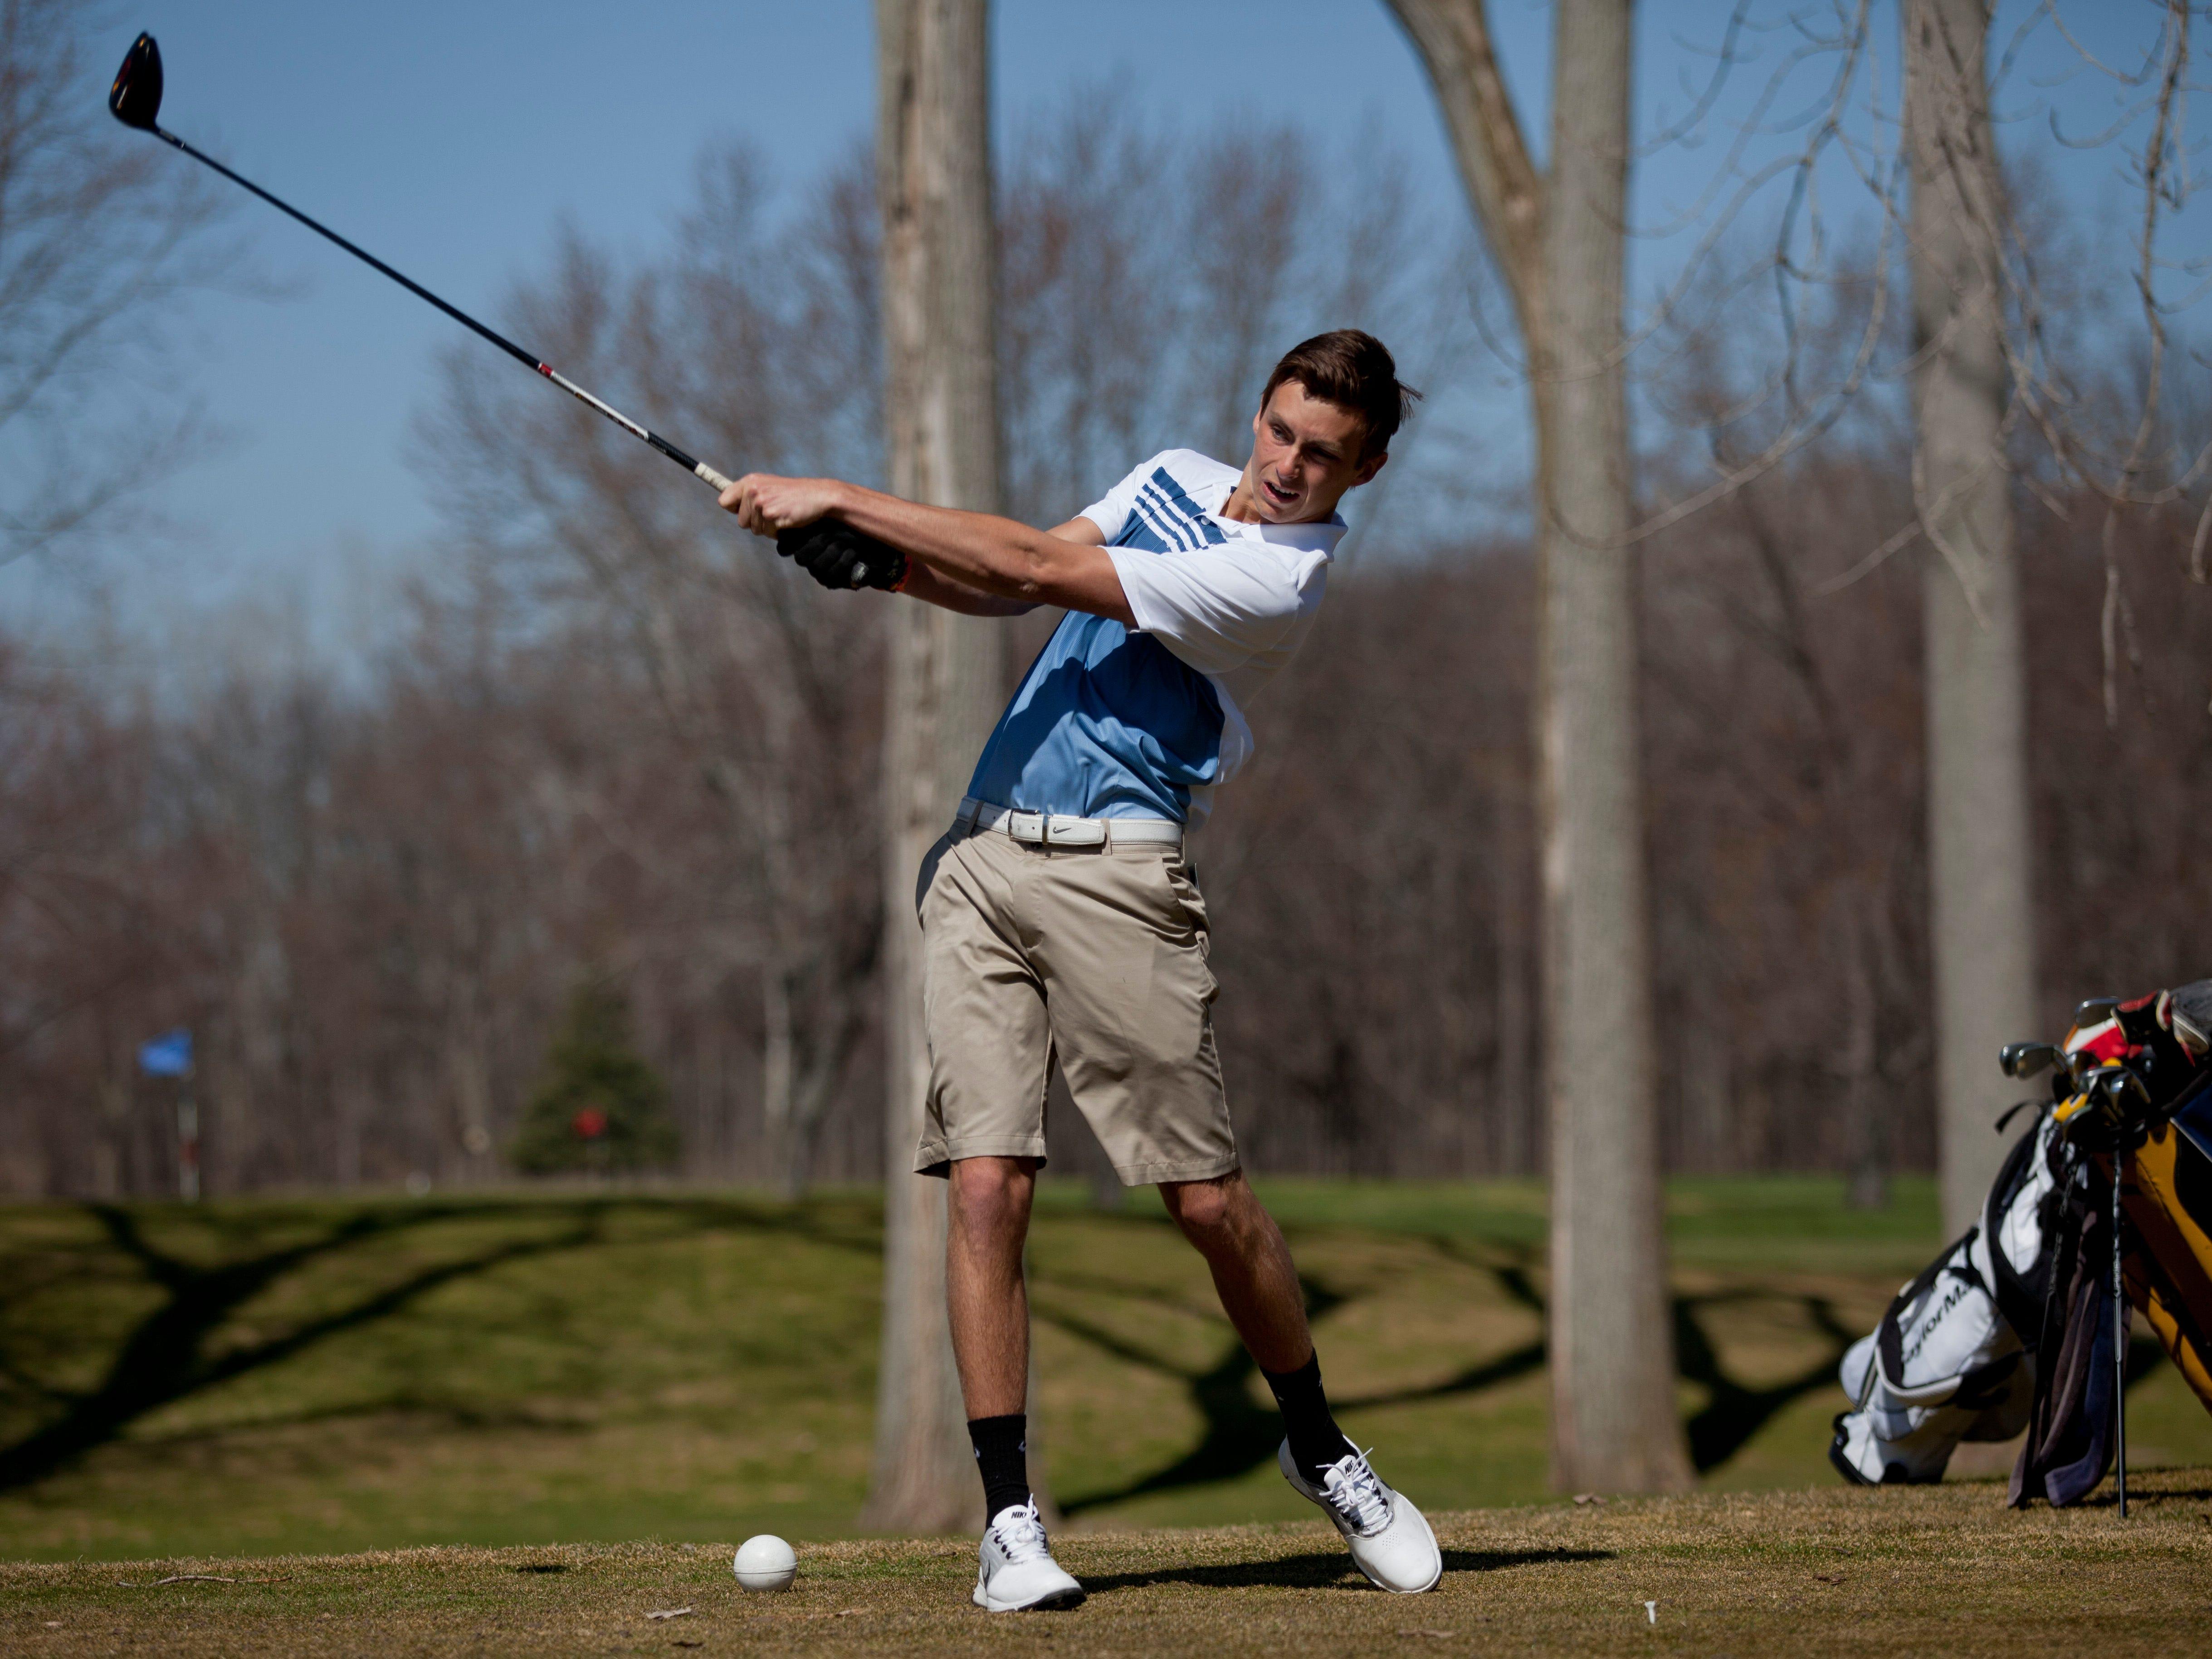 Port Huron Northern senior Nick Vranish, 18, tees off Friday, April 17, 2015 at the Port Huron Elks Golf Club in Port Huron Township.